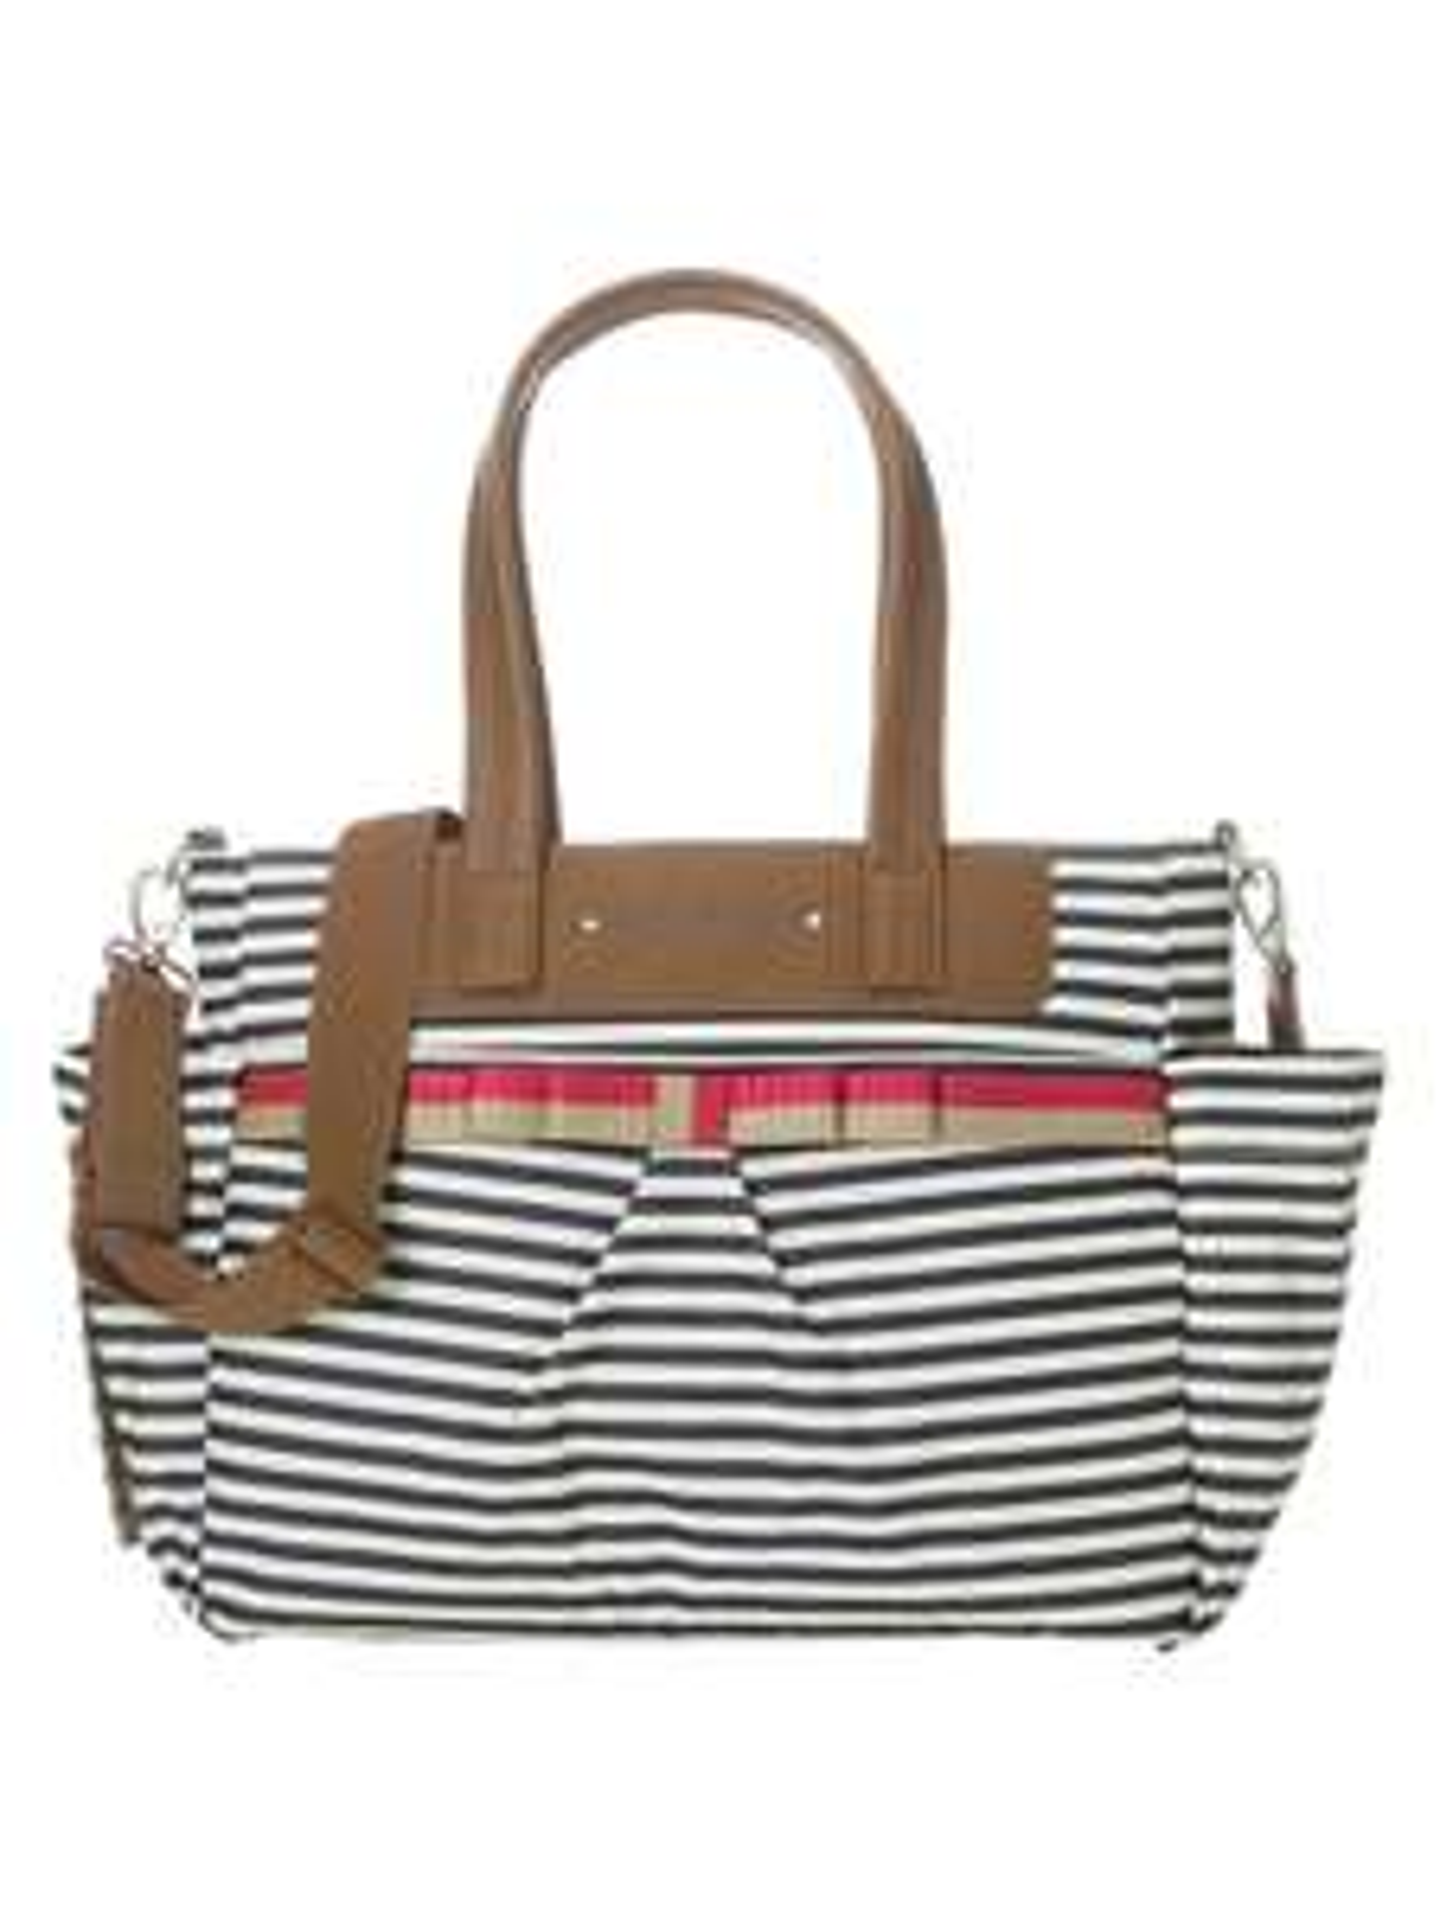 Babymel Cara Edition Changing Bag - Navy Stripe £32 @ Boots